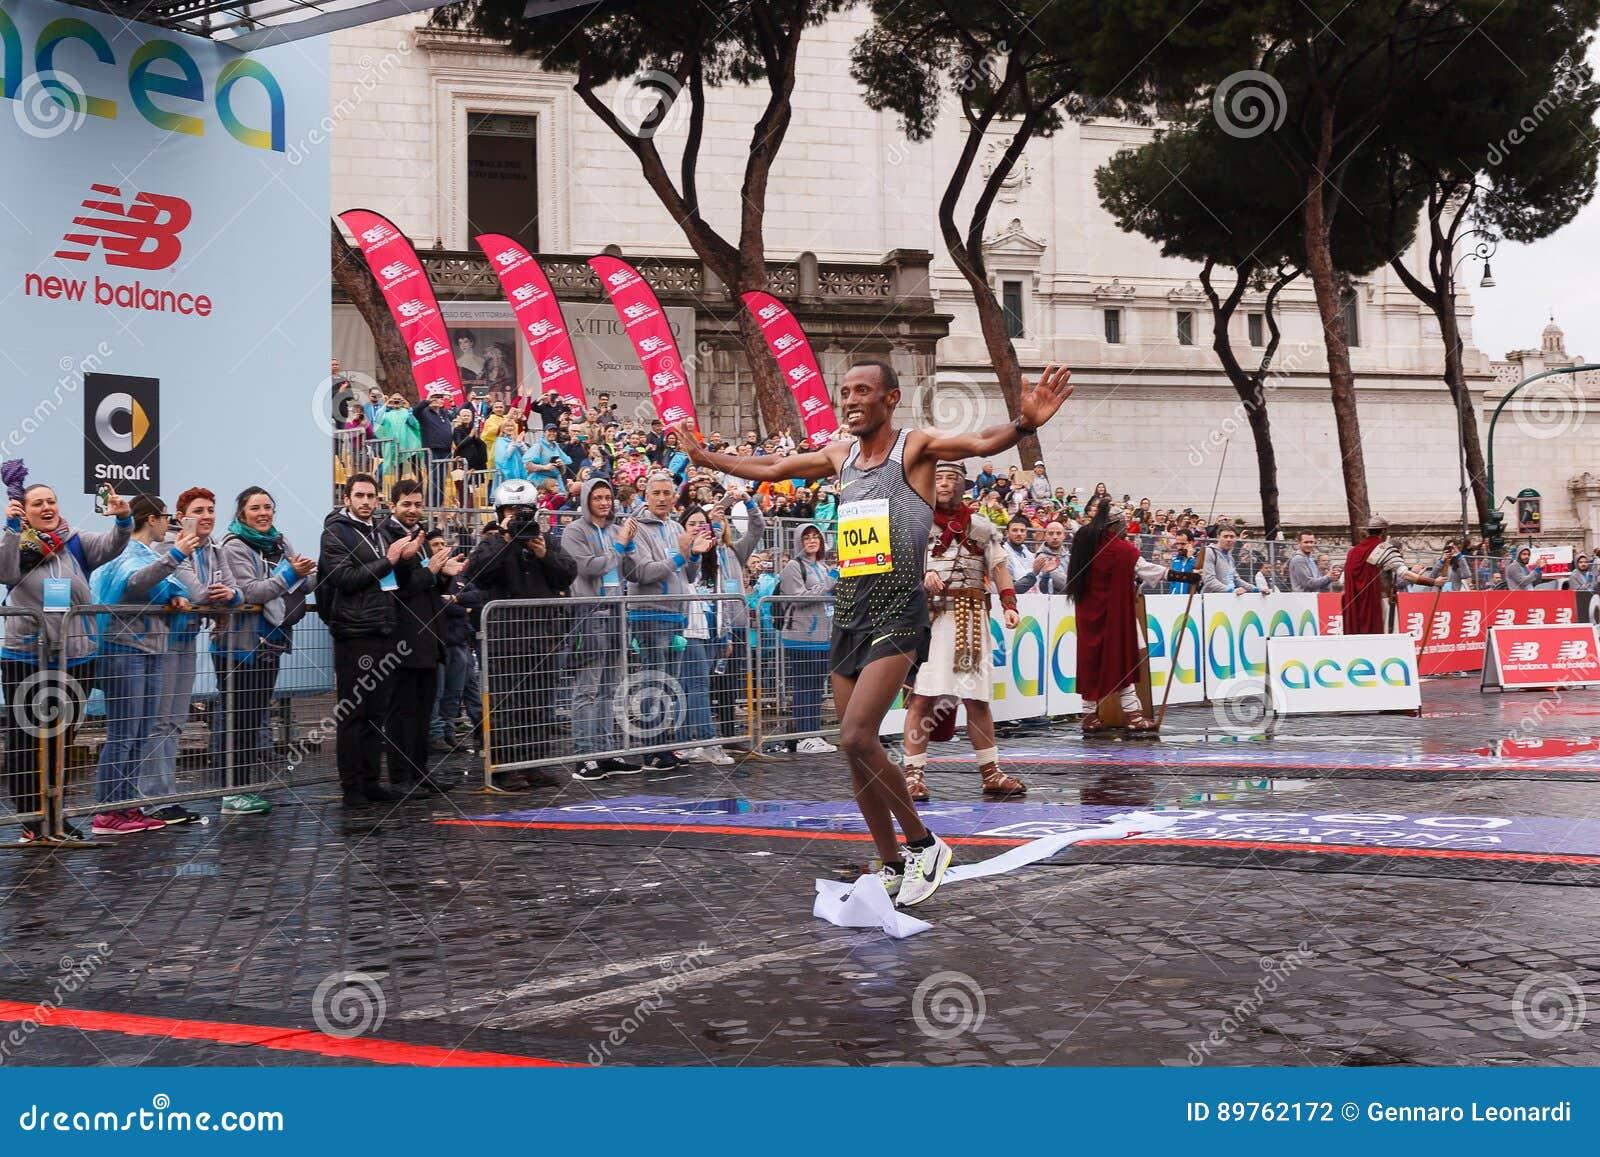 Tola Shura Kitata Wins The 23rd Marathon In Rome Editorial ...